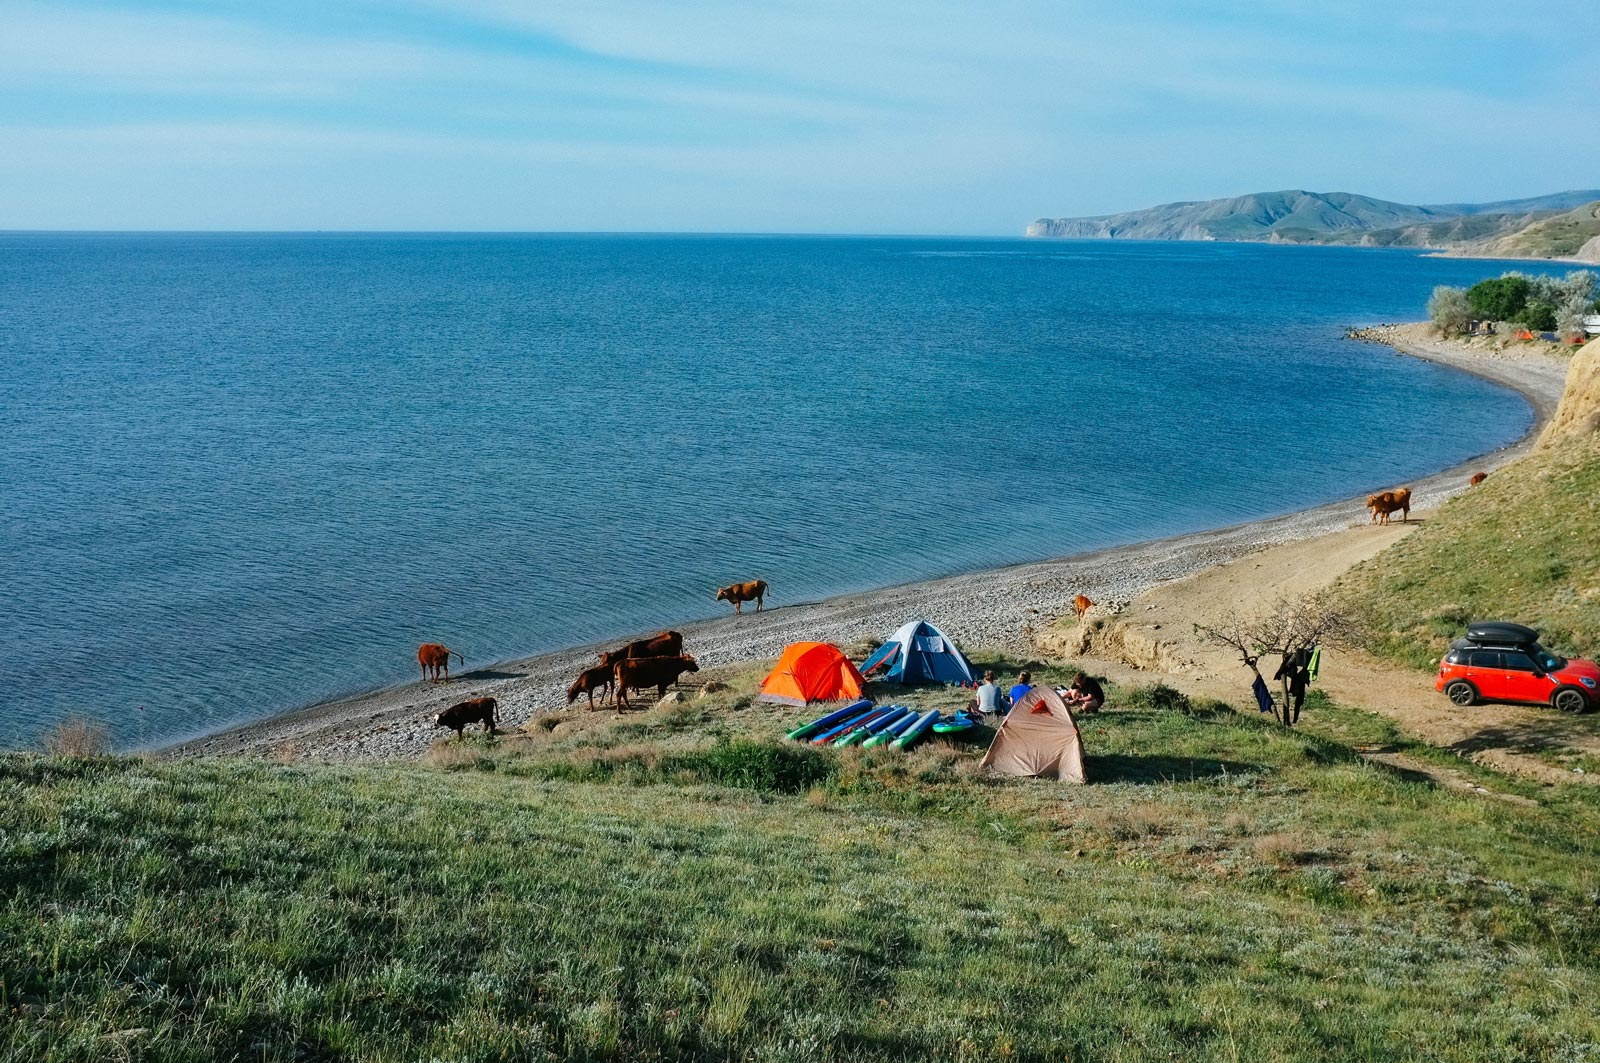 julia-karpacheva-paddleboarding-russia-black-sea-camp-site